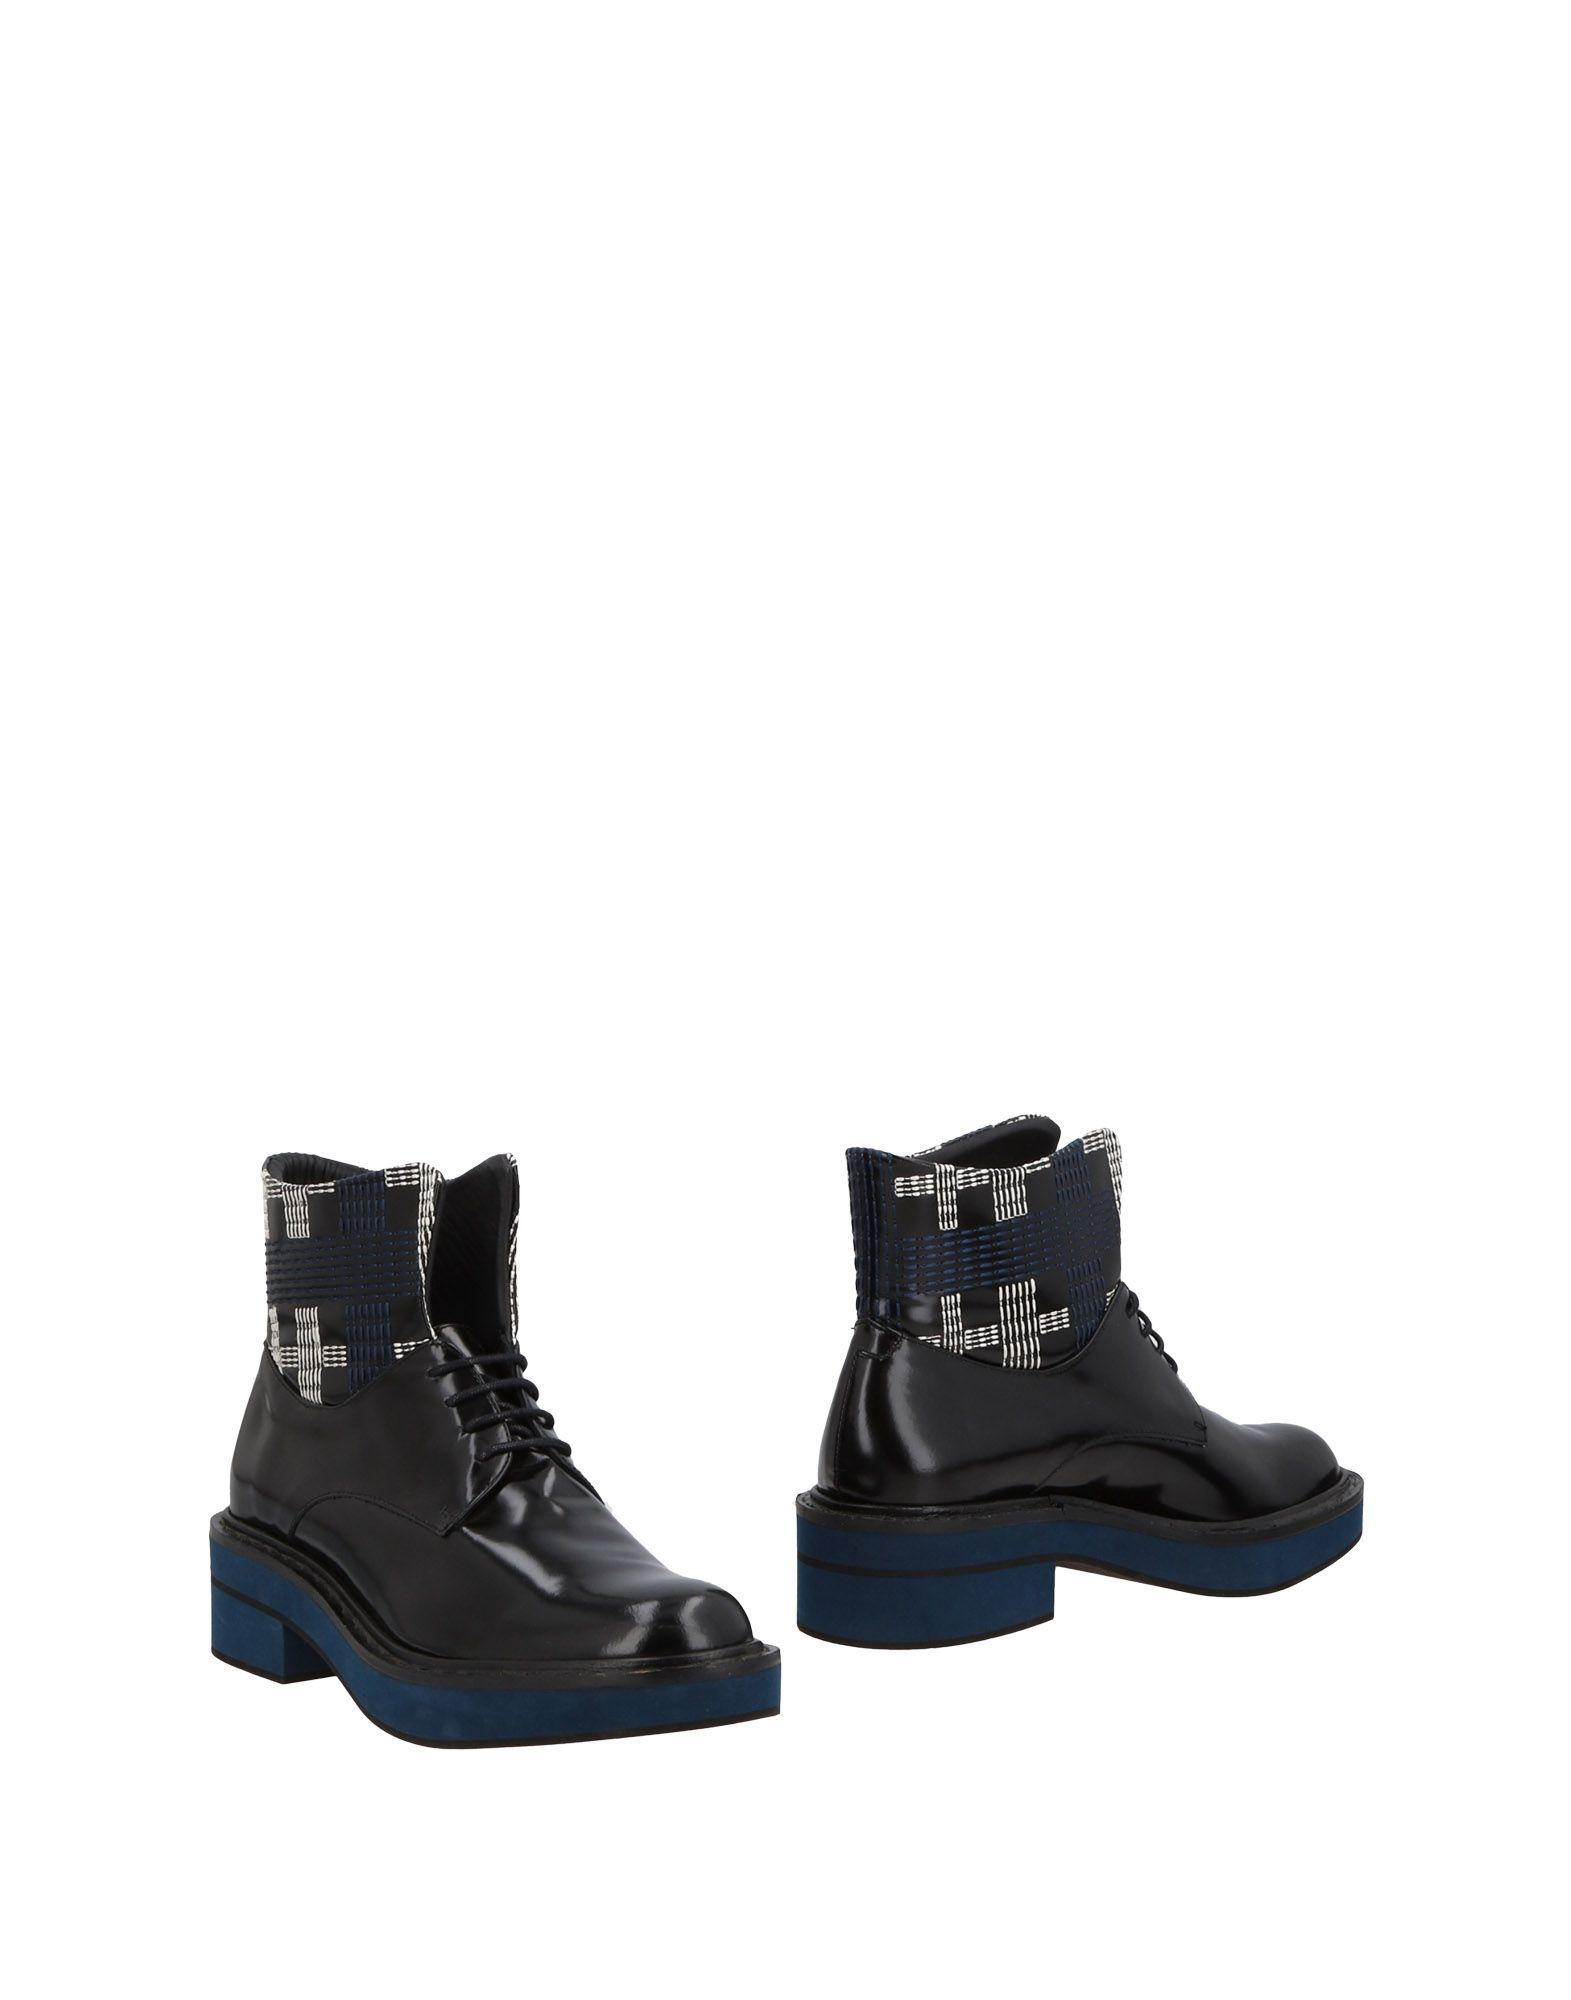 Paloma Barceló Stiefelette Damen  11482301LSGut aussehende strapazierfähige Schuhe